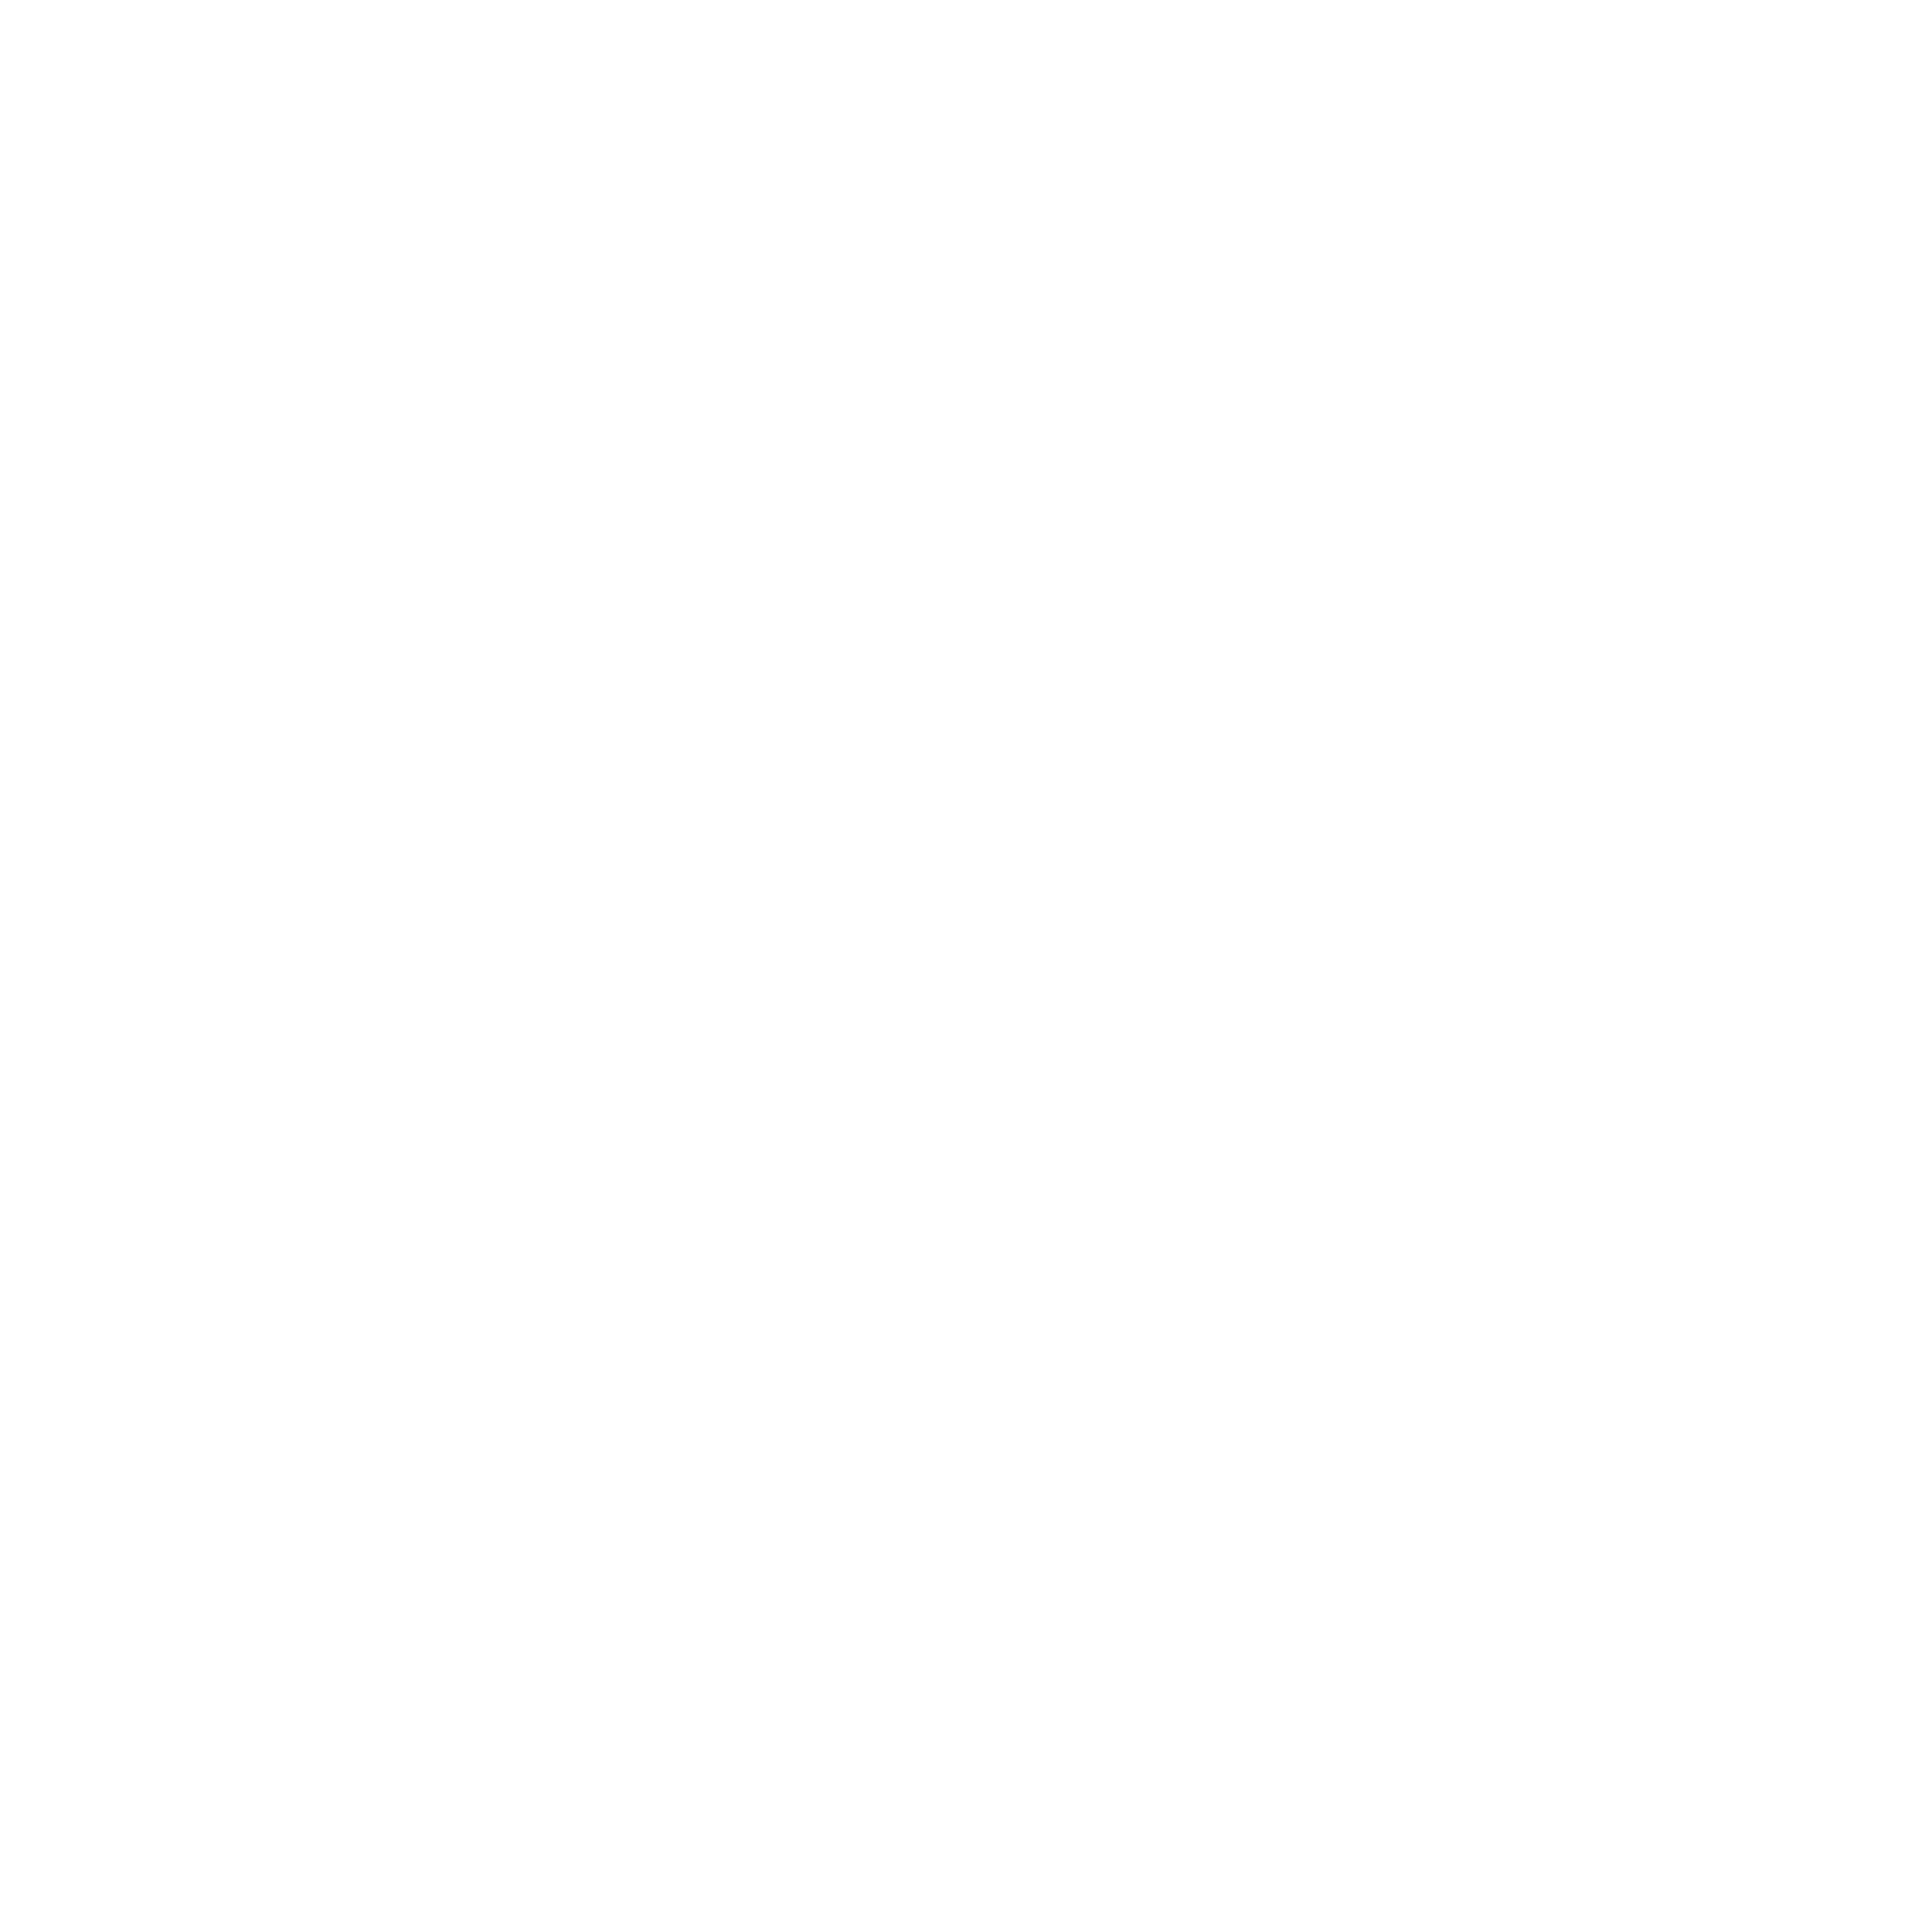 Light Up Bra Corset- Black & White Corset Top